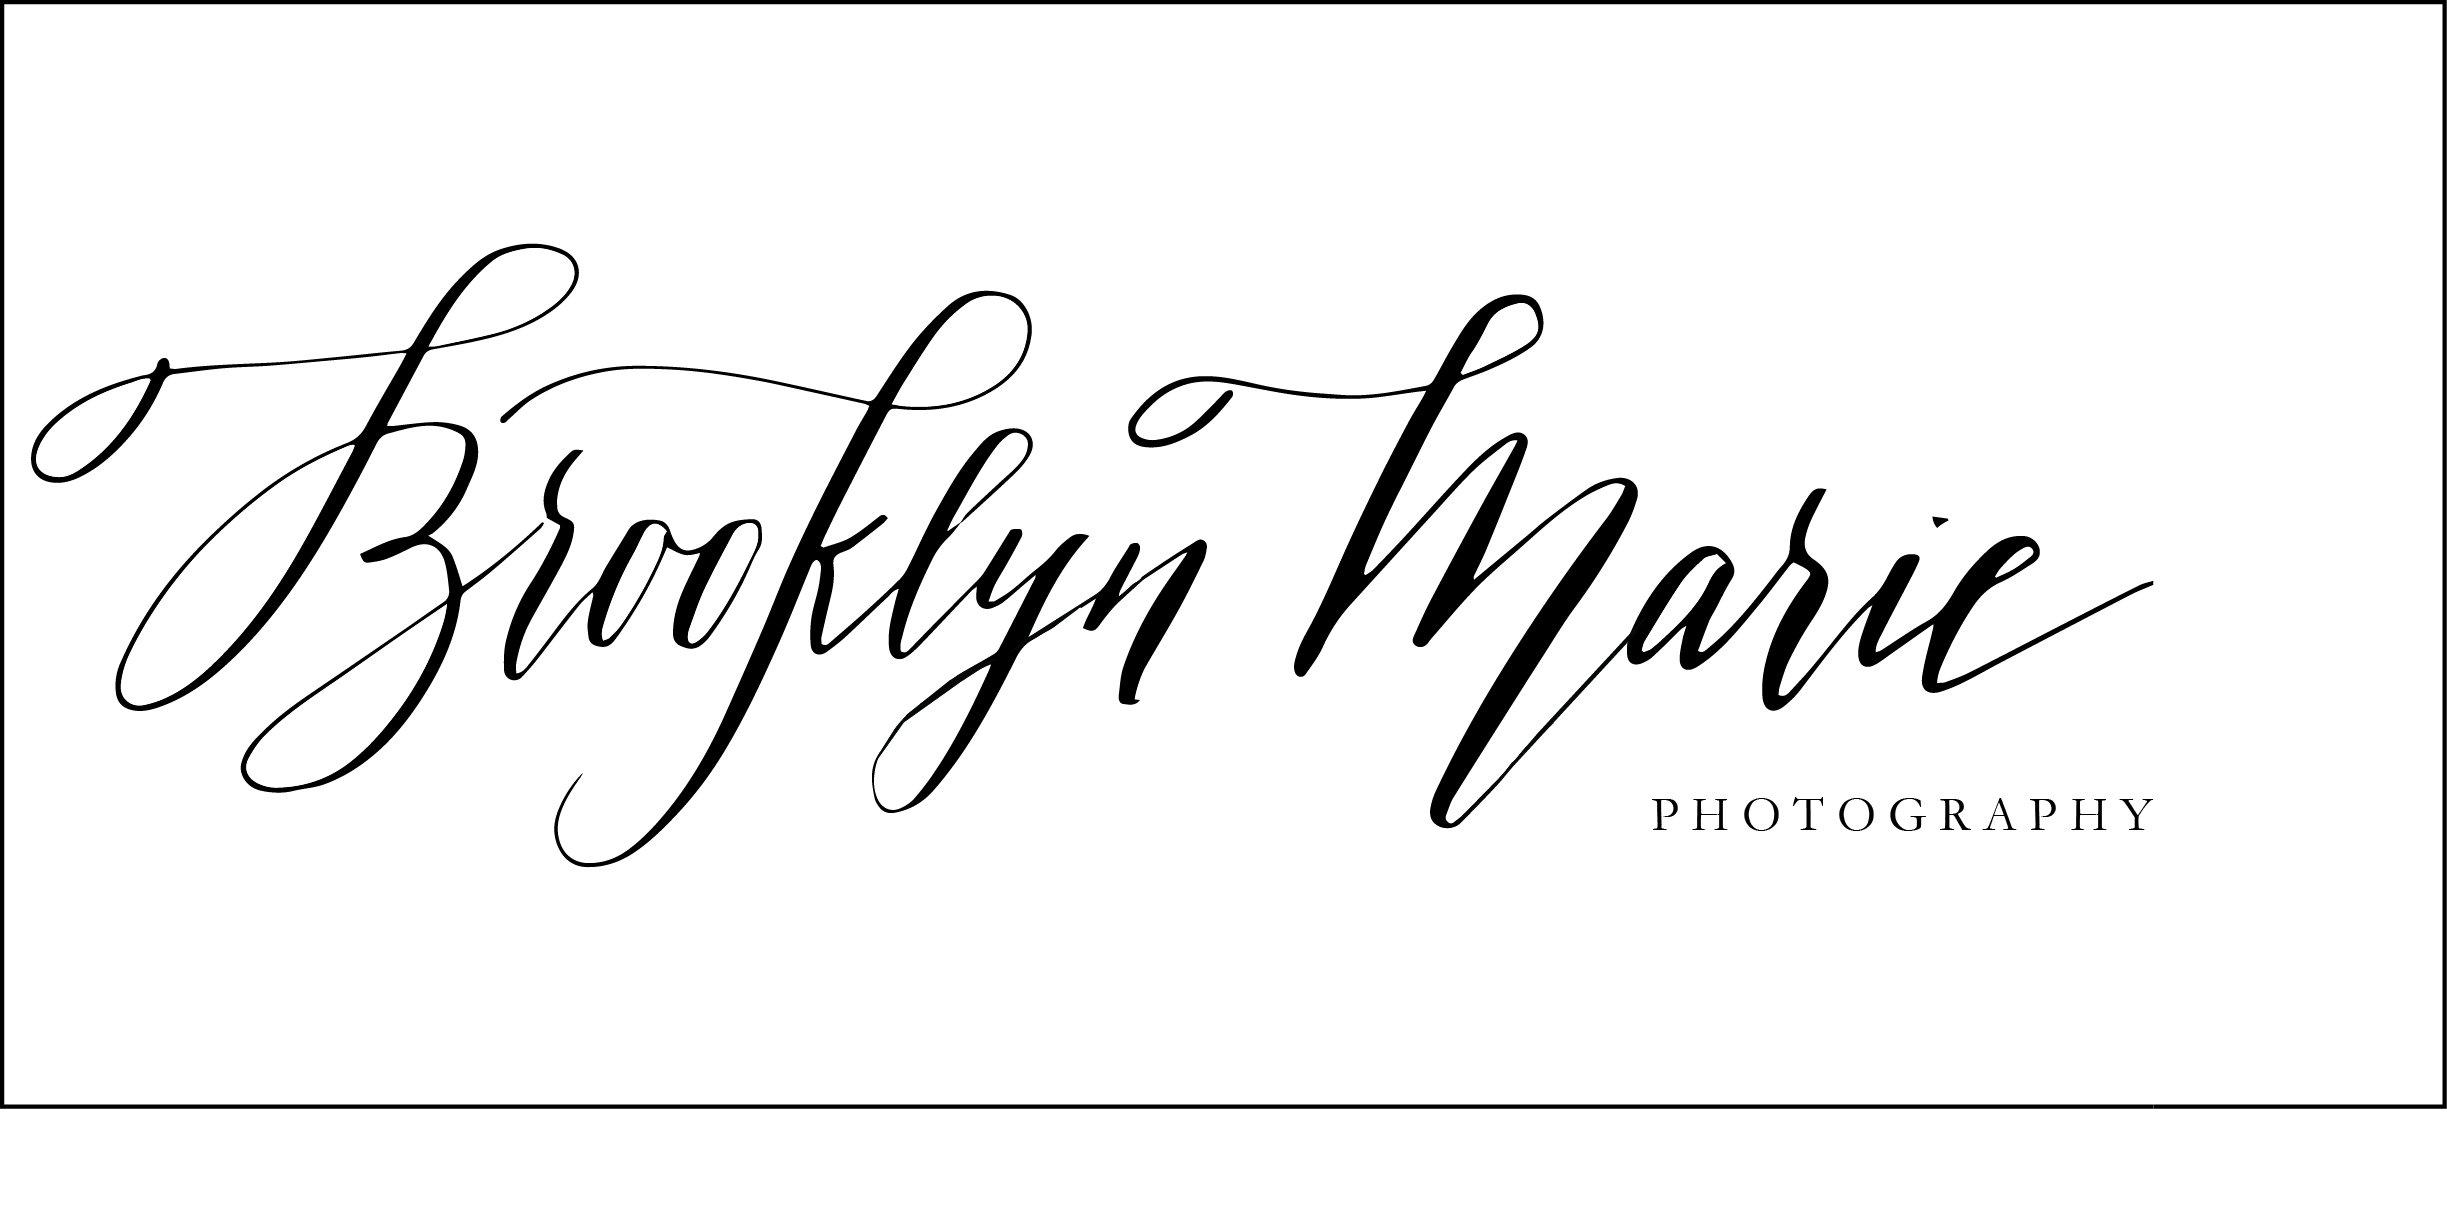 Custom Calligraphy Logo by Kelsey Malie Calligraphy